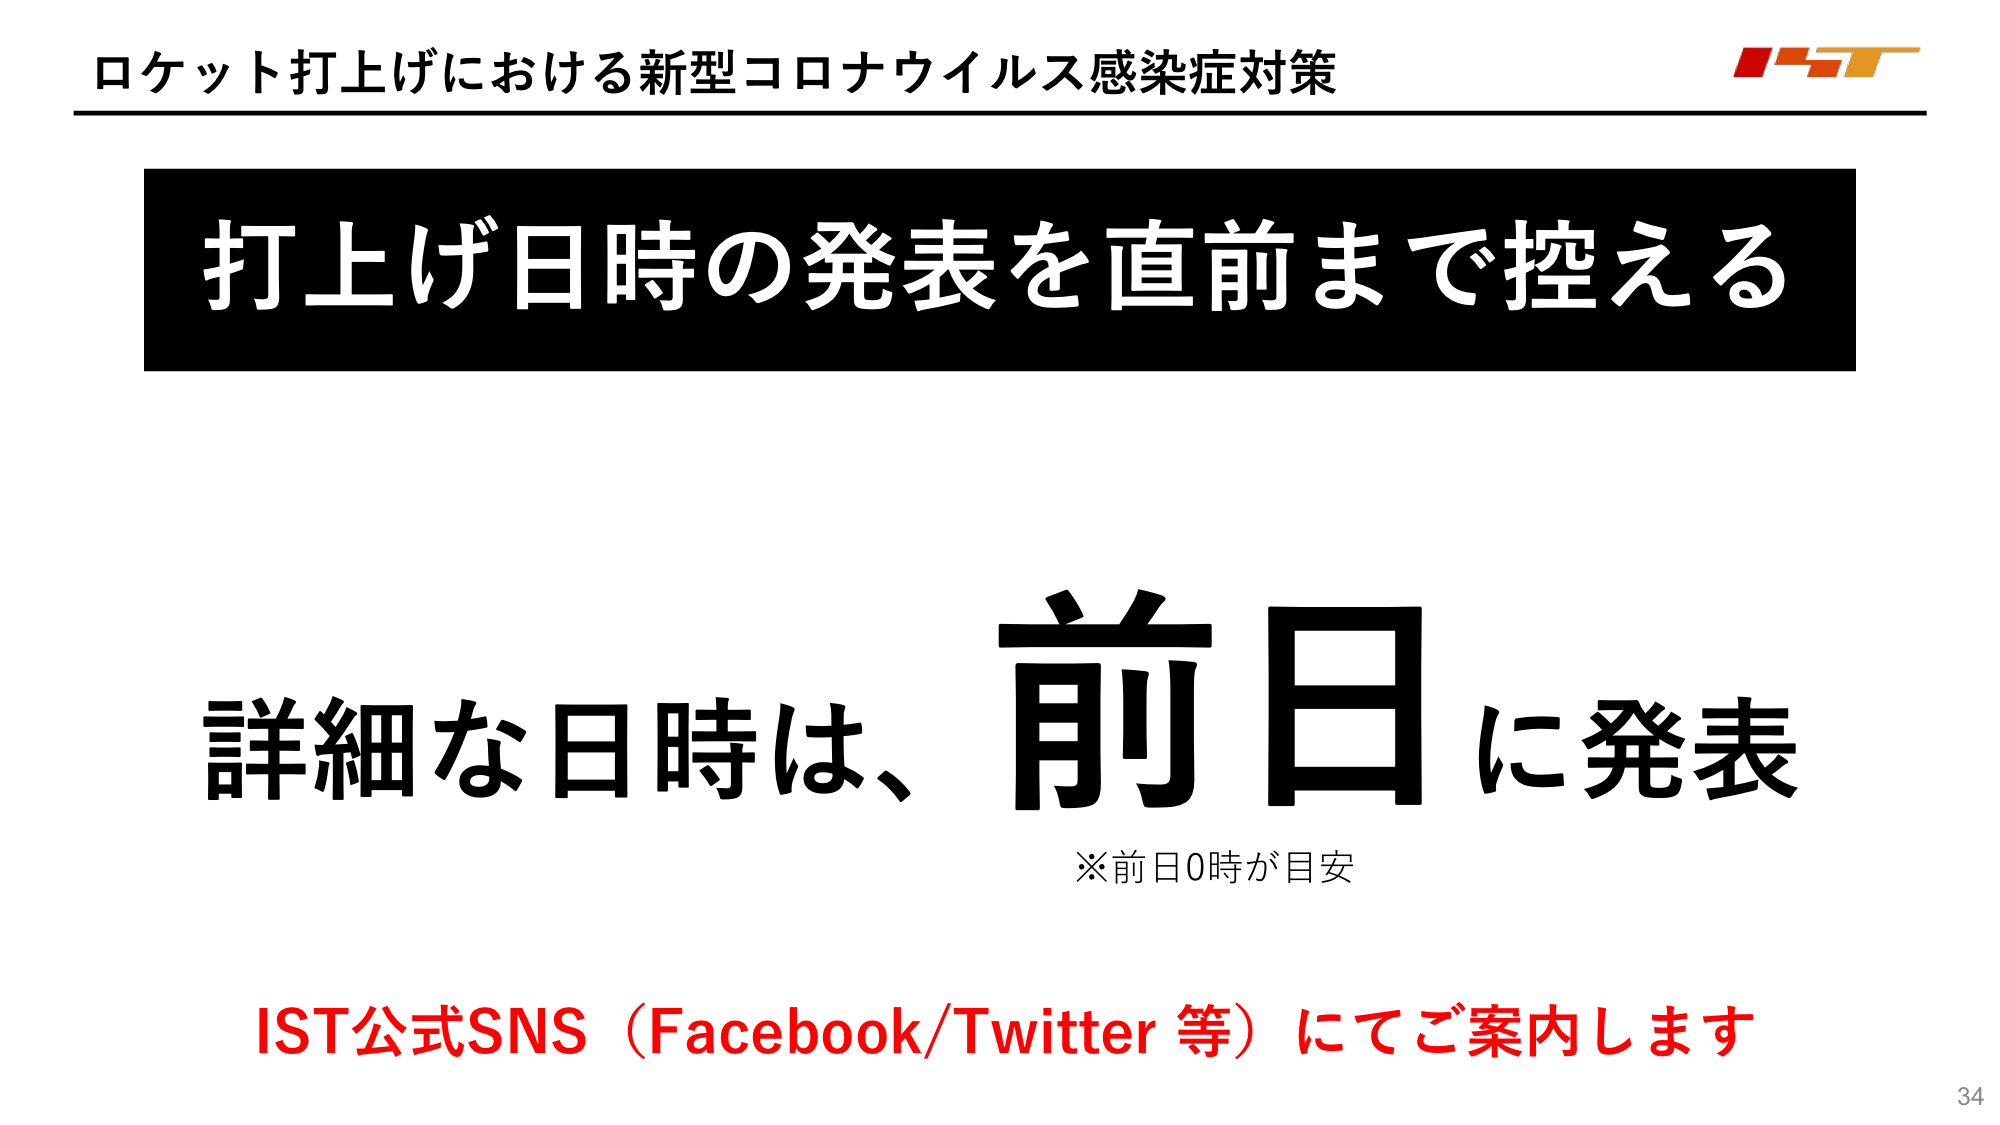 f:id:Imamura:20200603233026p:plain